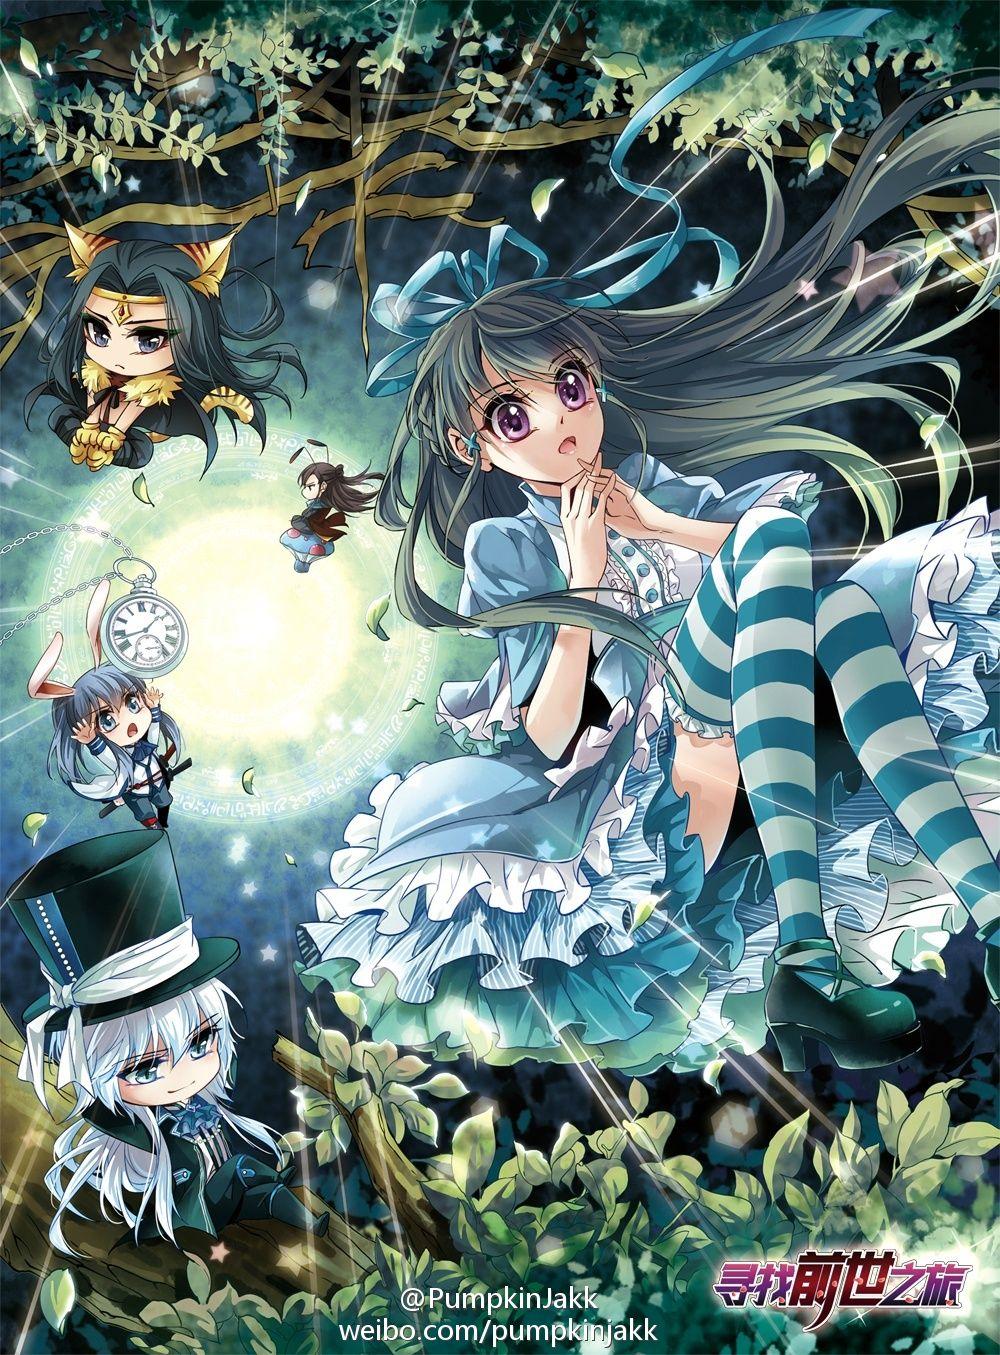 6759350bgw1ey7rkx0u8gj20rs11nqlu Jpg 1000 1355 Anime